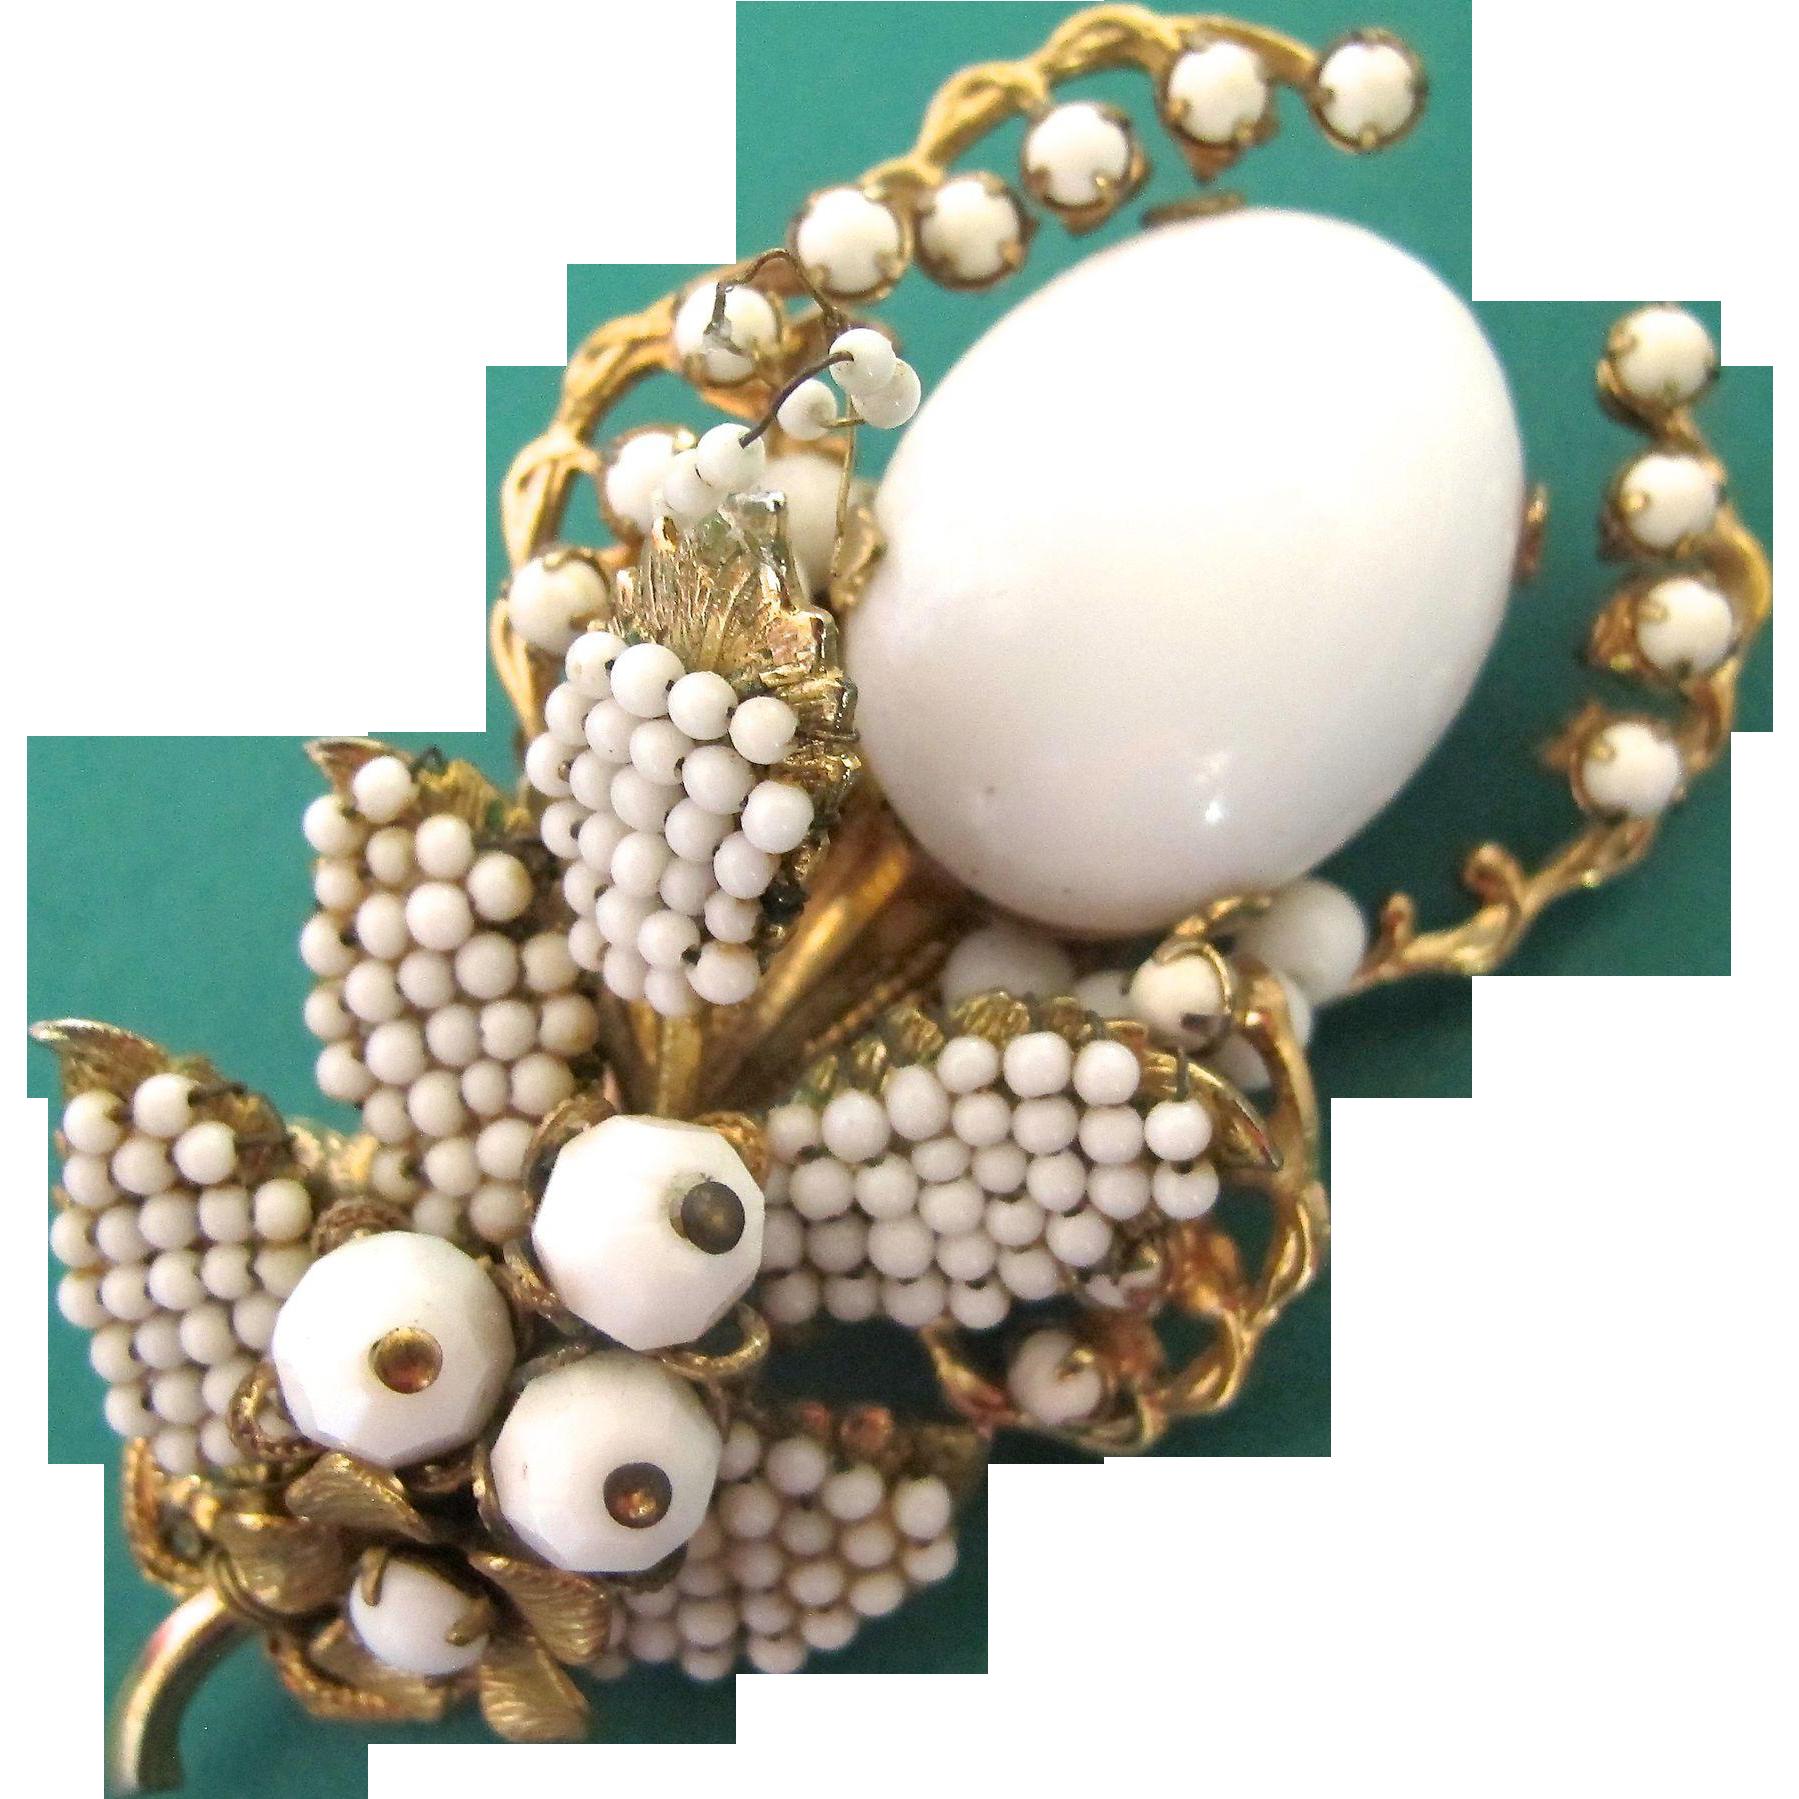 Brooch Beads: Vintage Eugene White Bead Flower Brooch From